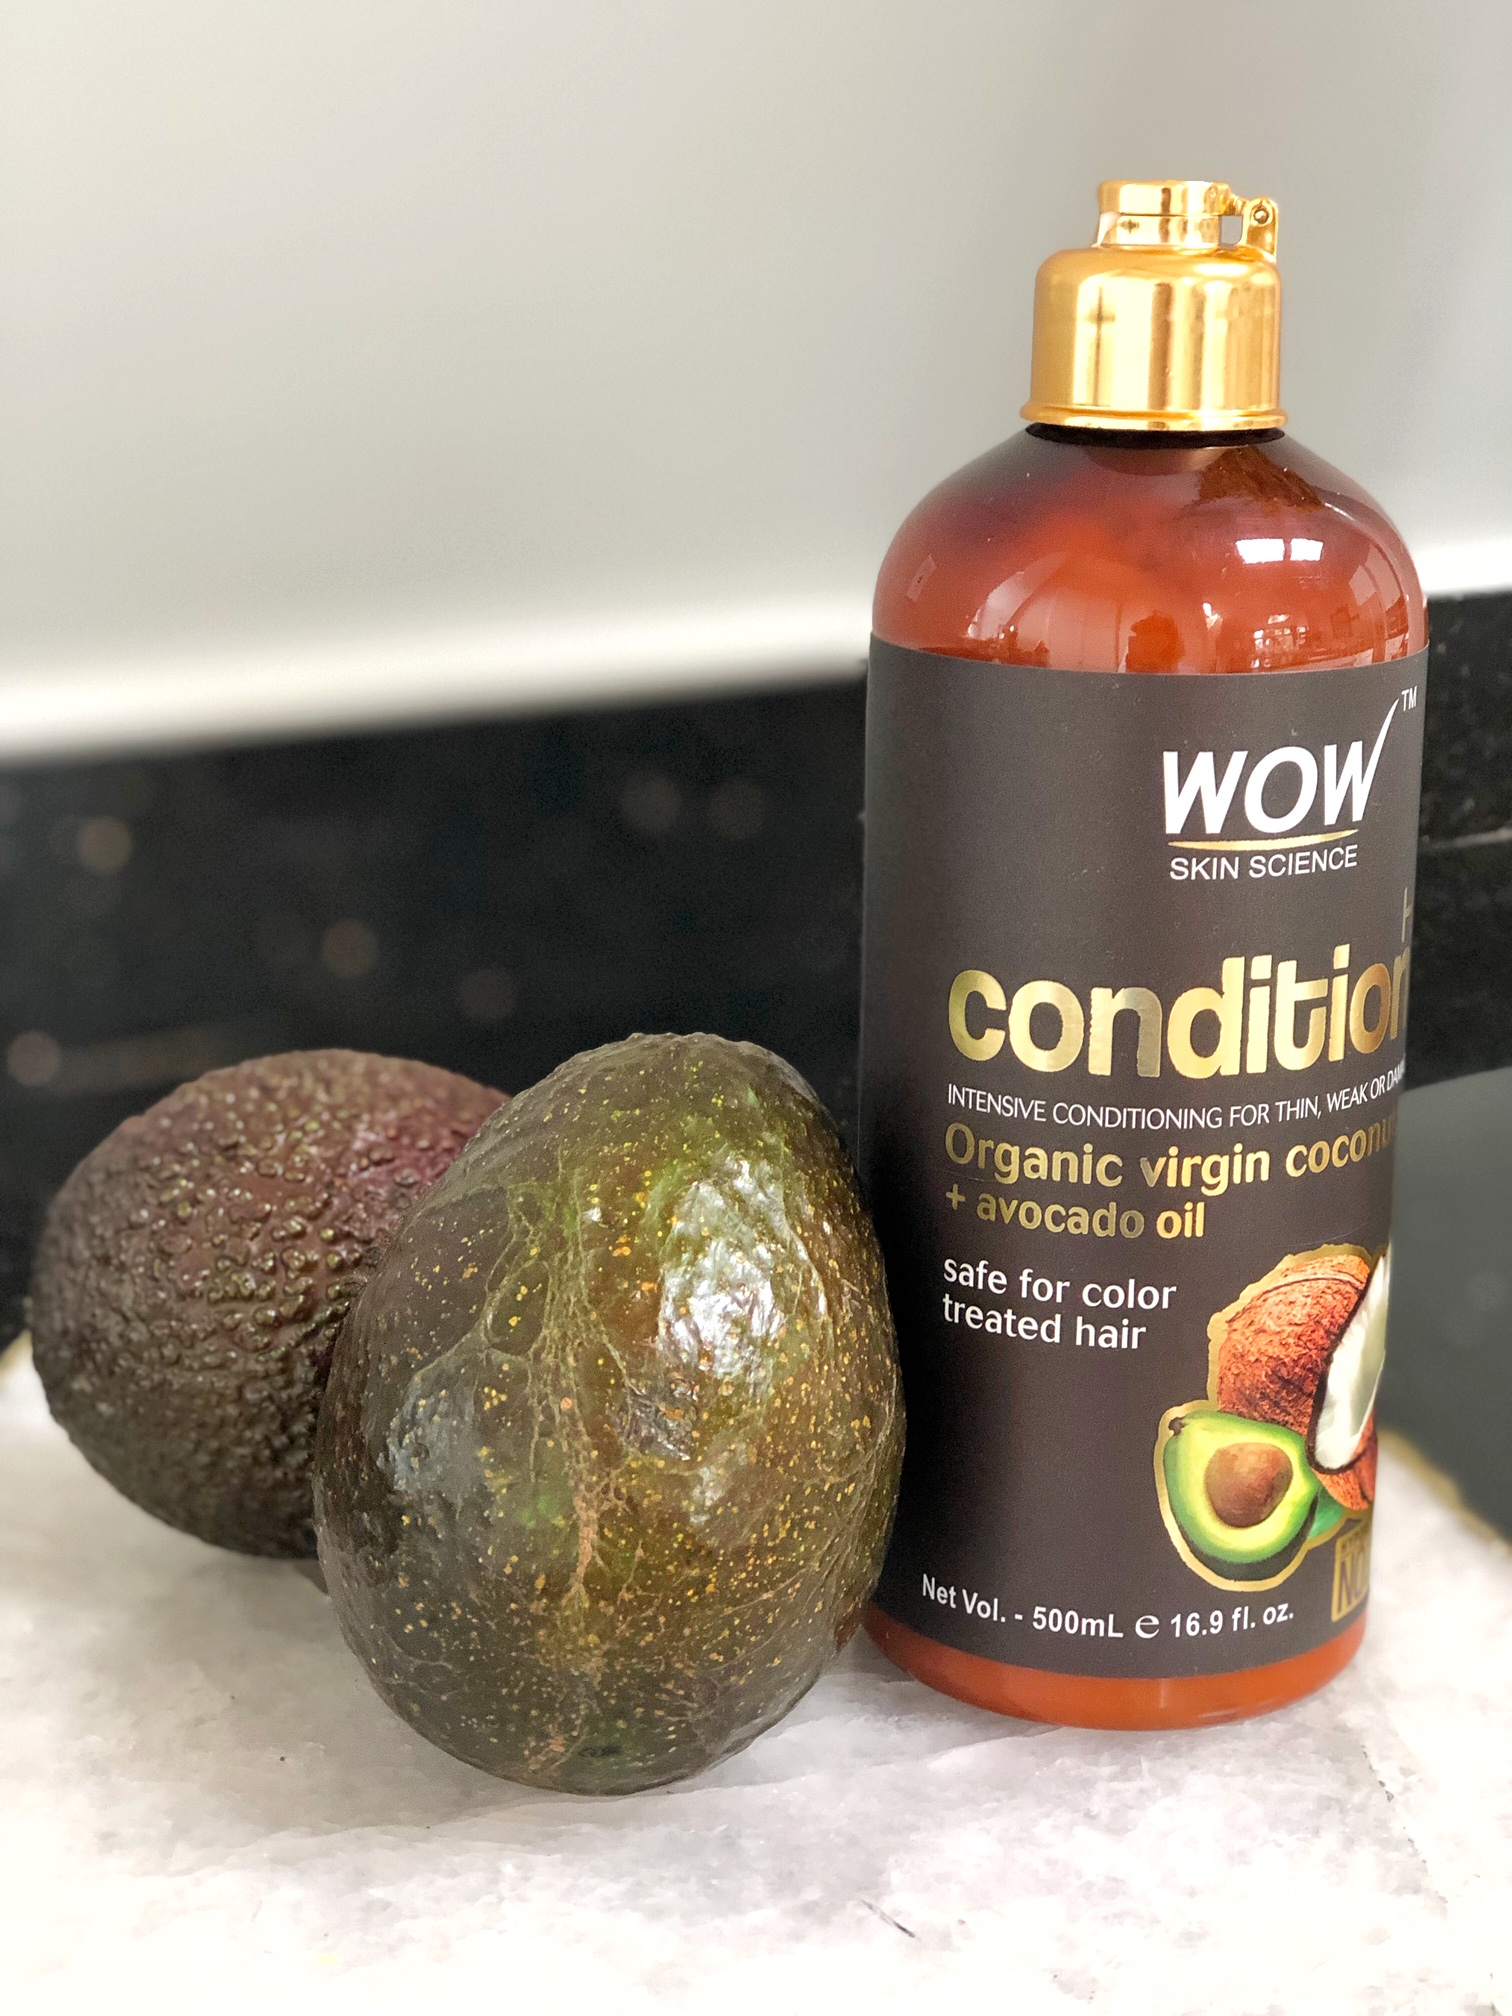 Wow Skin Science Apple Cider Vinegar, the-alyst.com